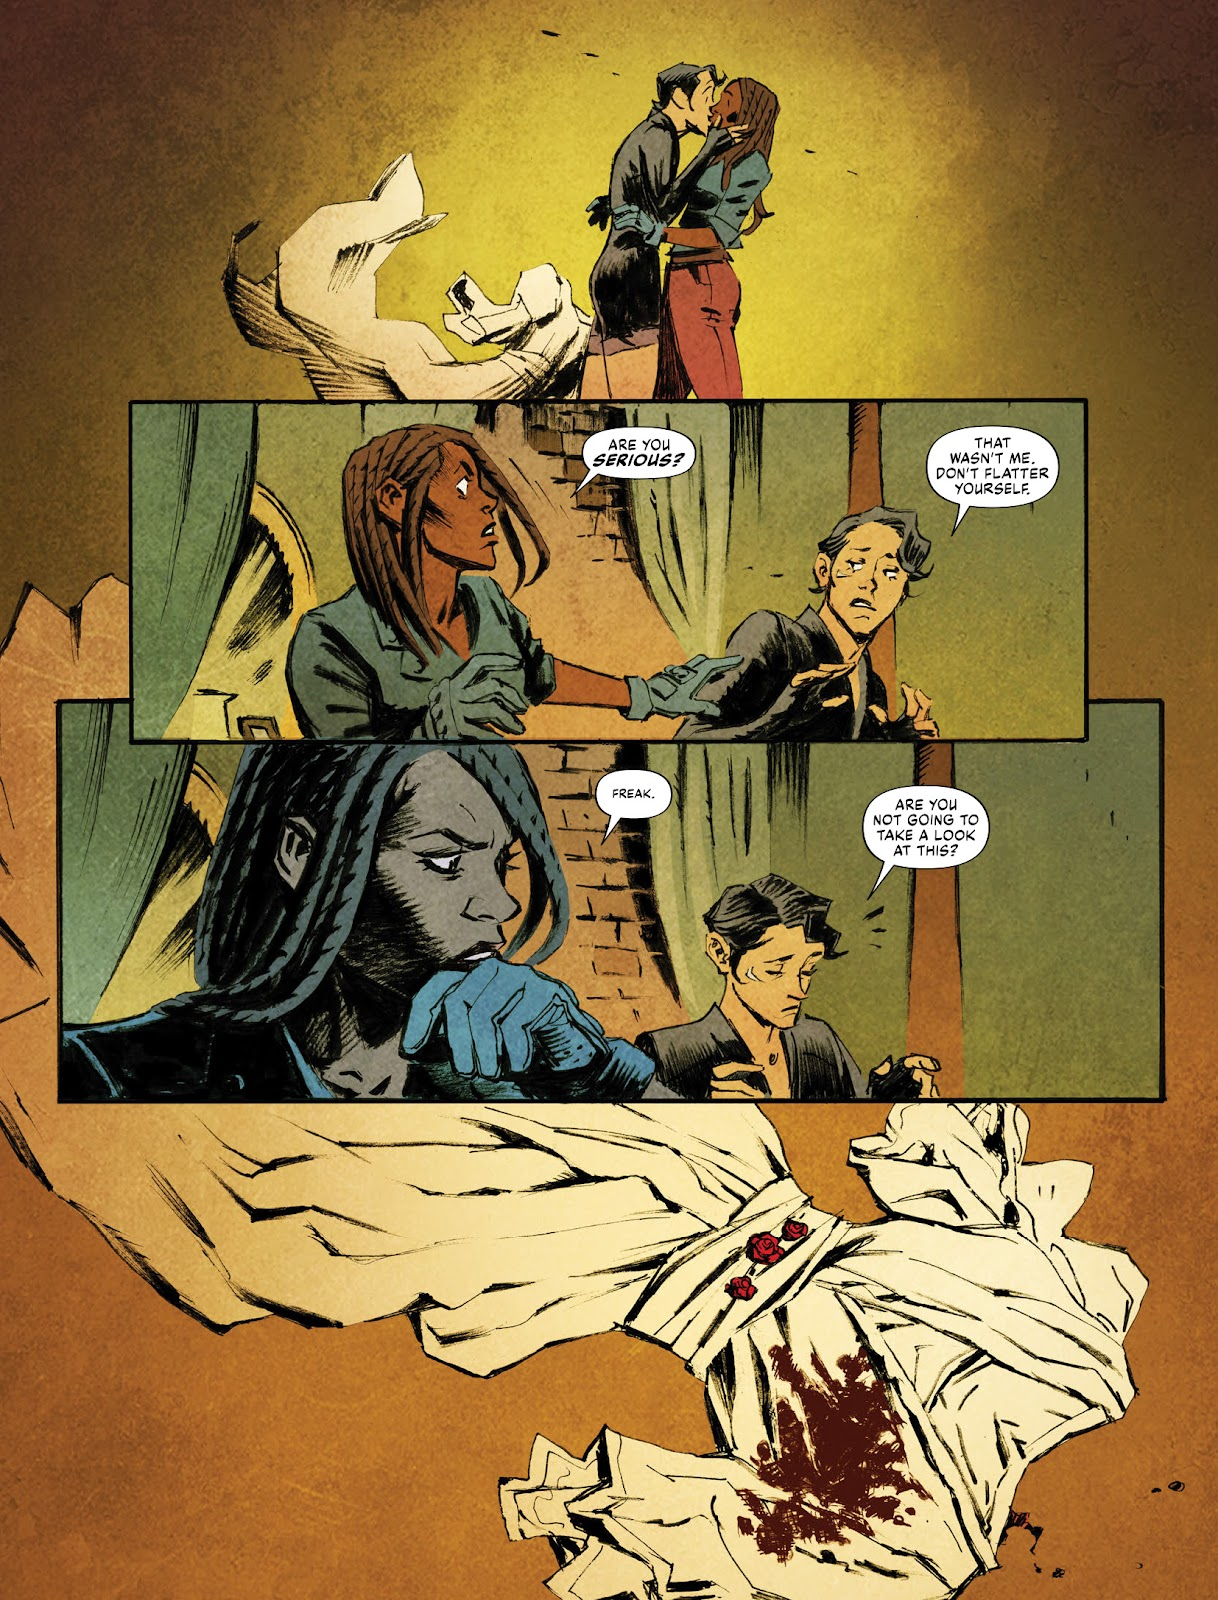 Judge Dredd Megazine (Vol. 5) issue 427 - Page 46